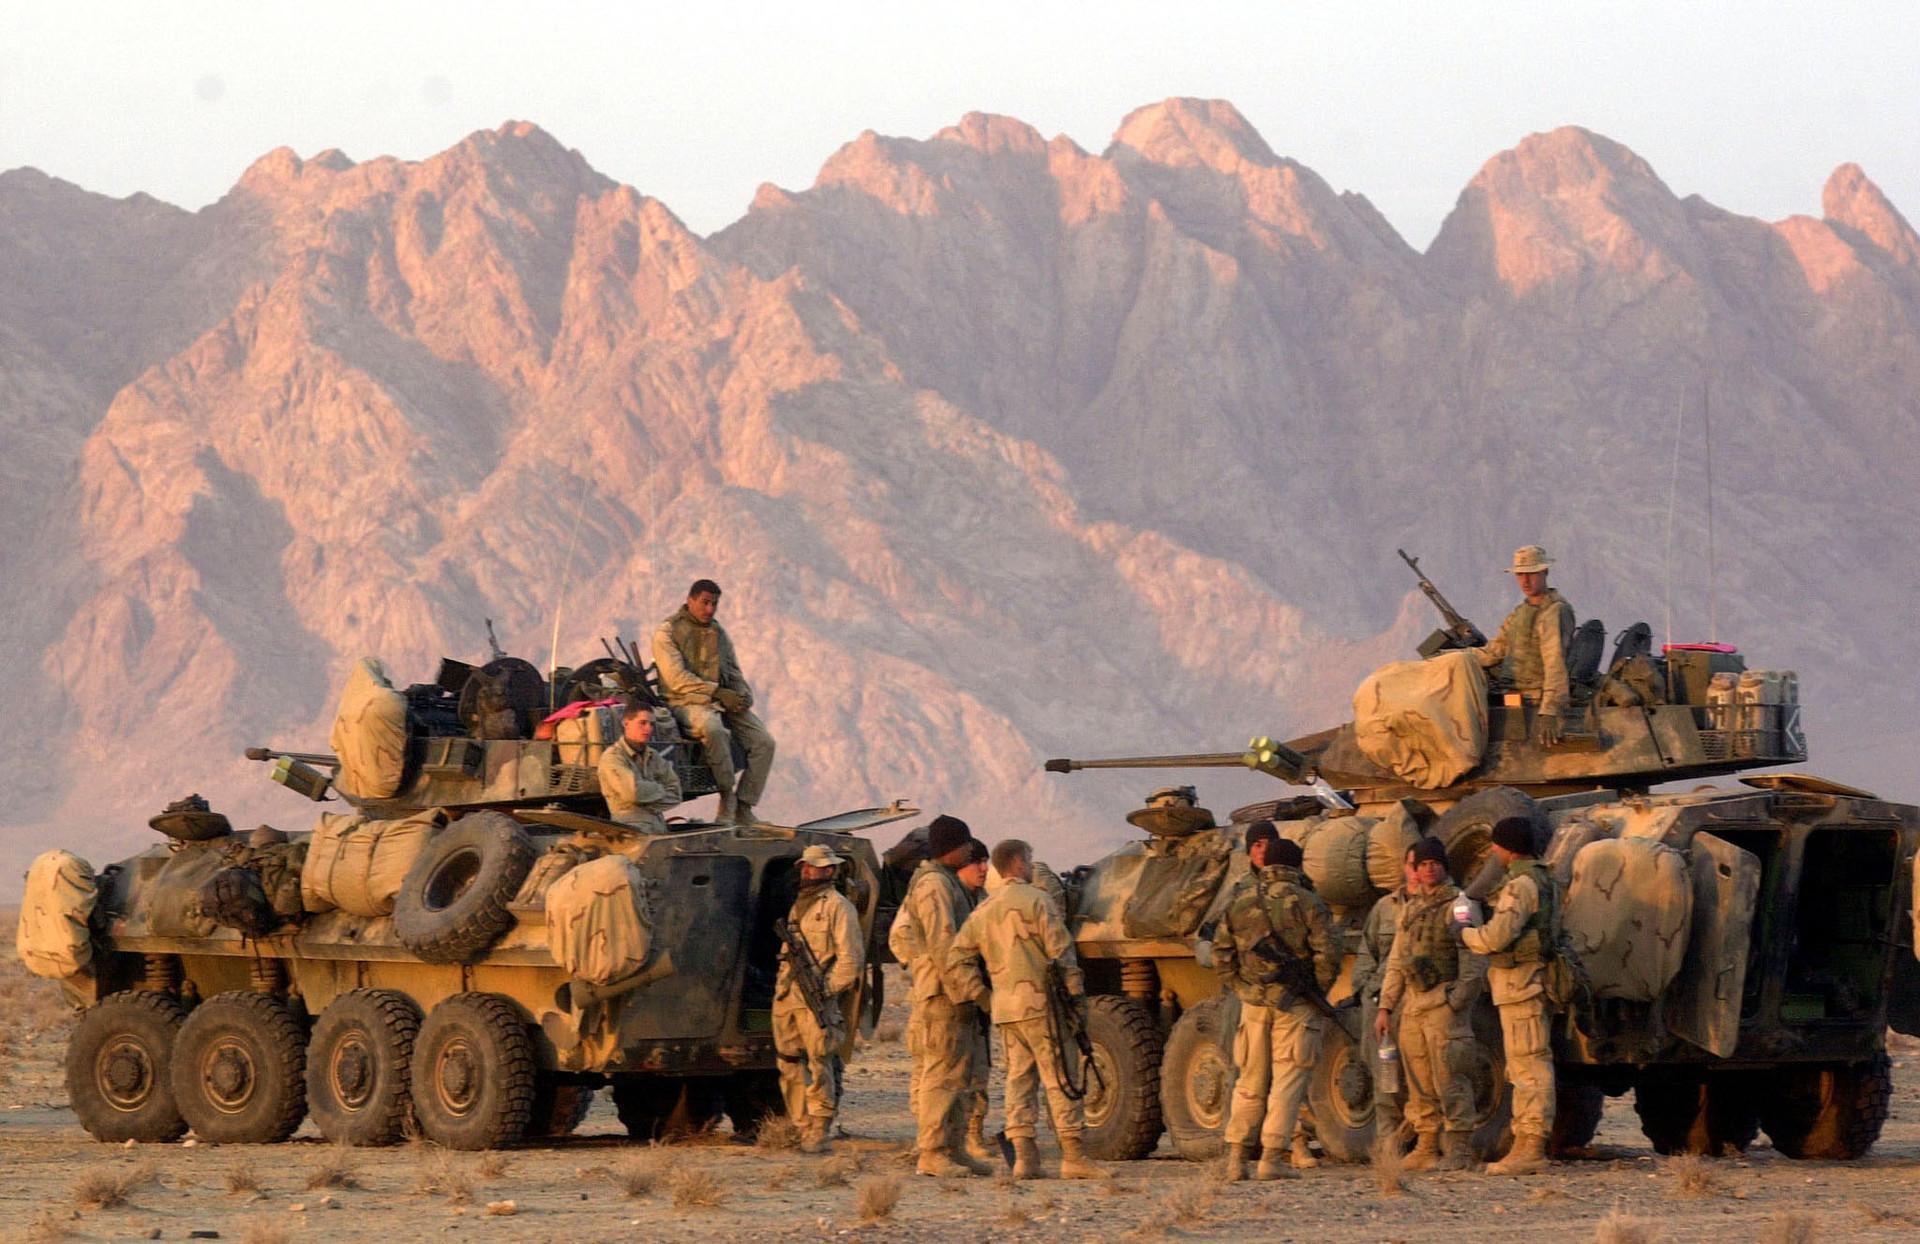 Картинка об афгане